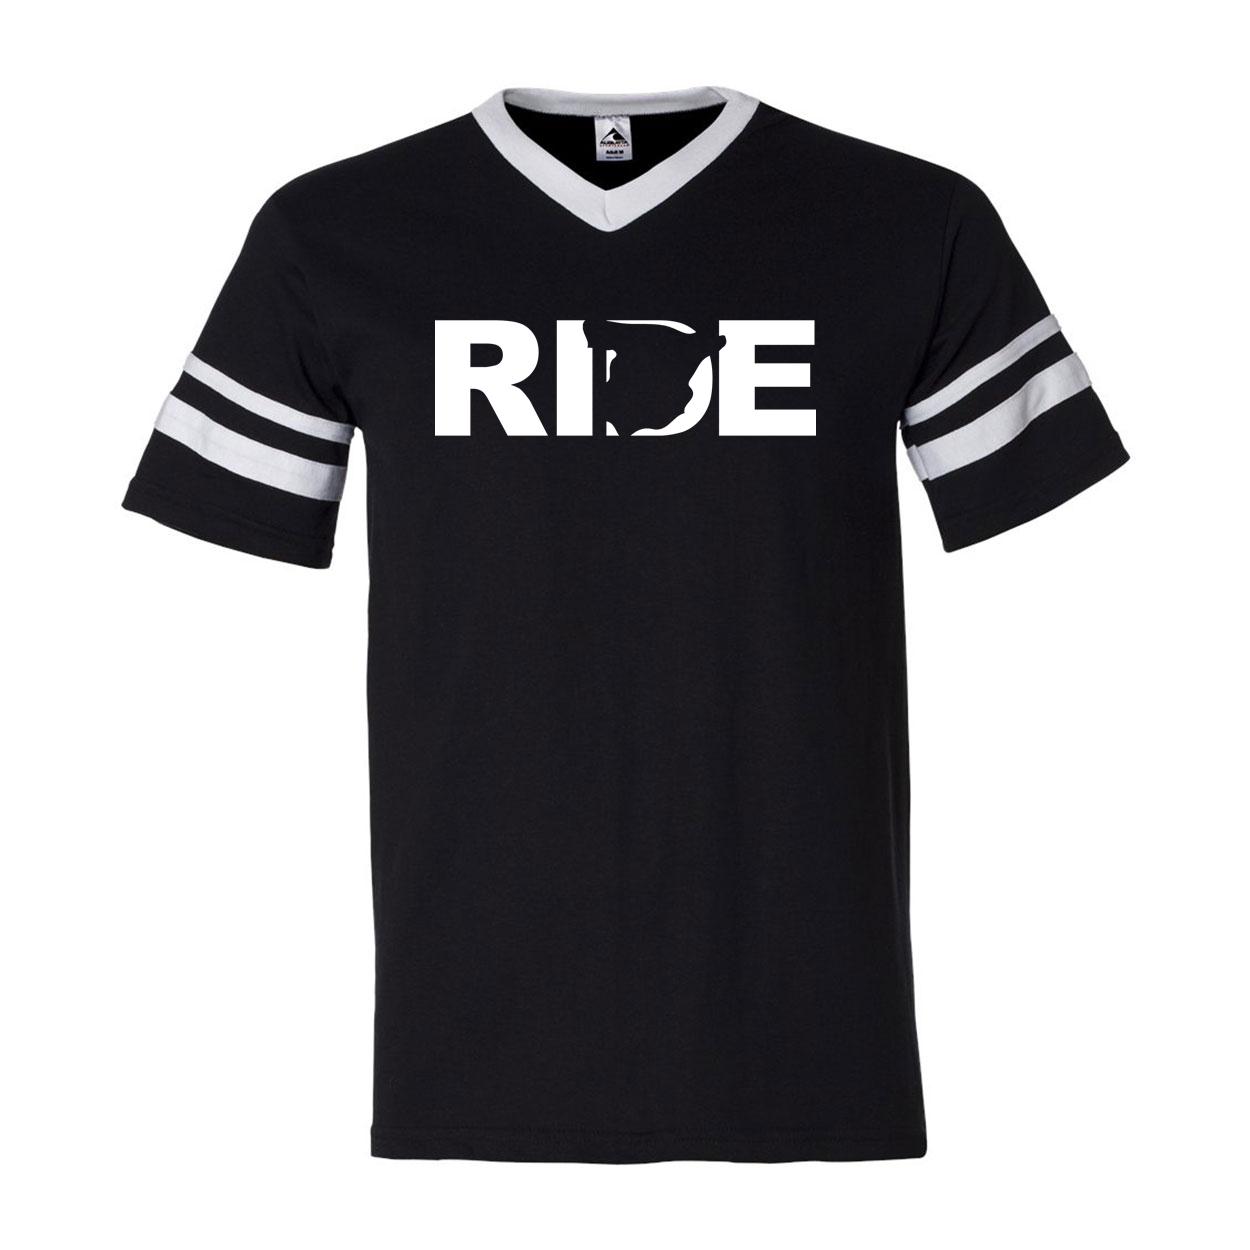 Ride Spain Classic Premium Striped Jersey T-Shirt Black/White (White Logo)